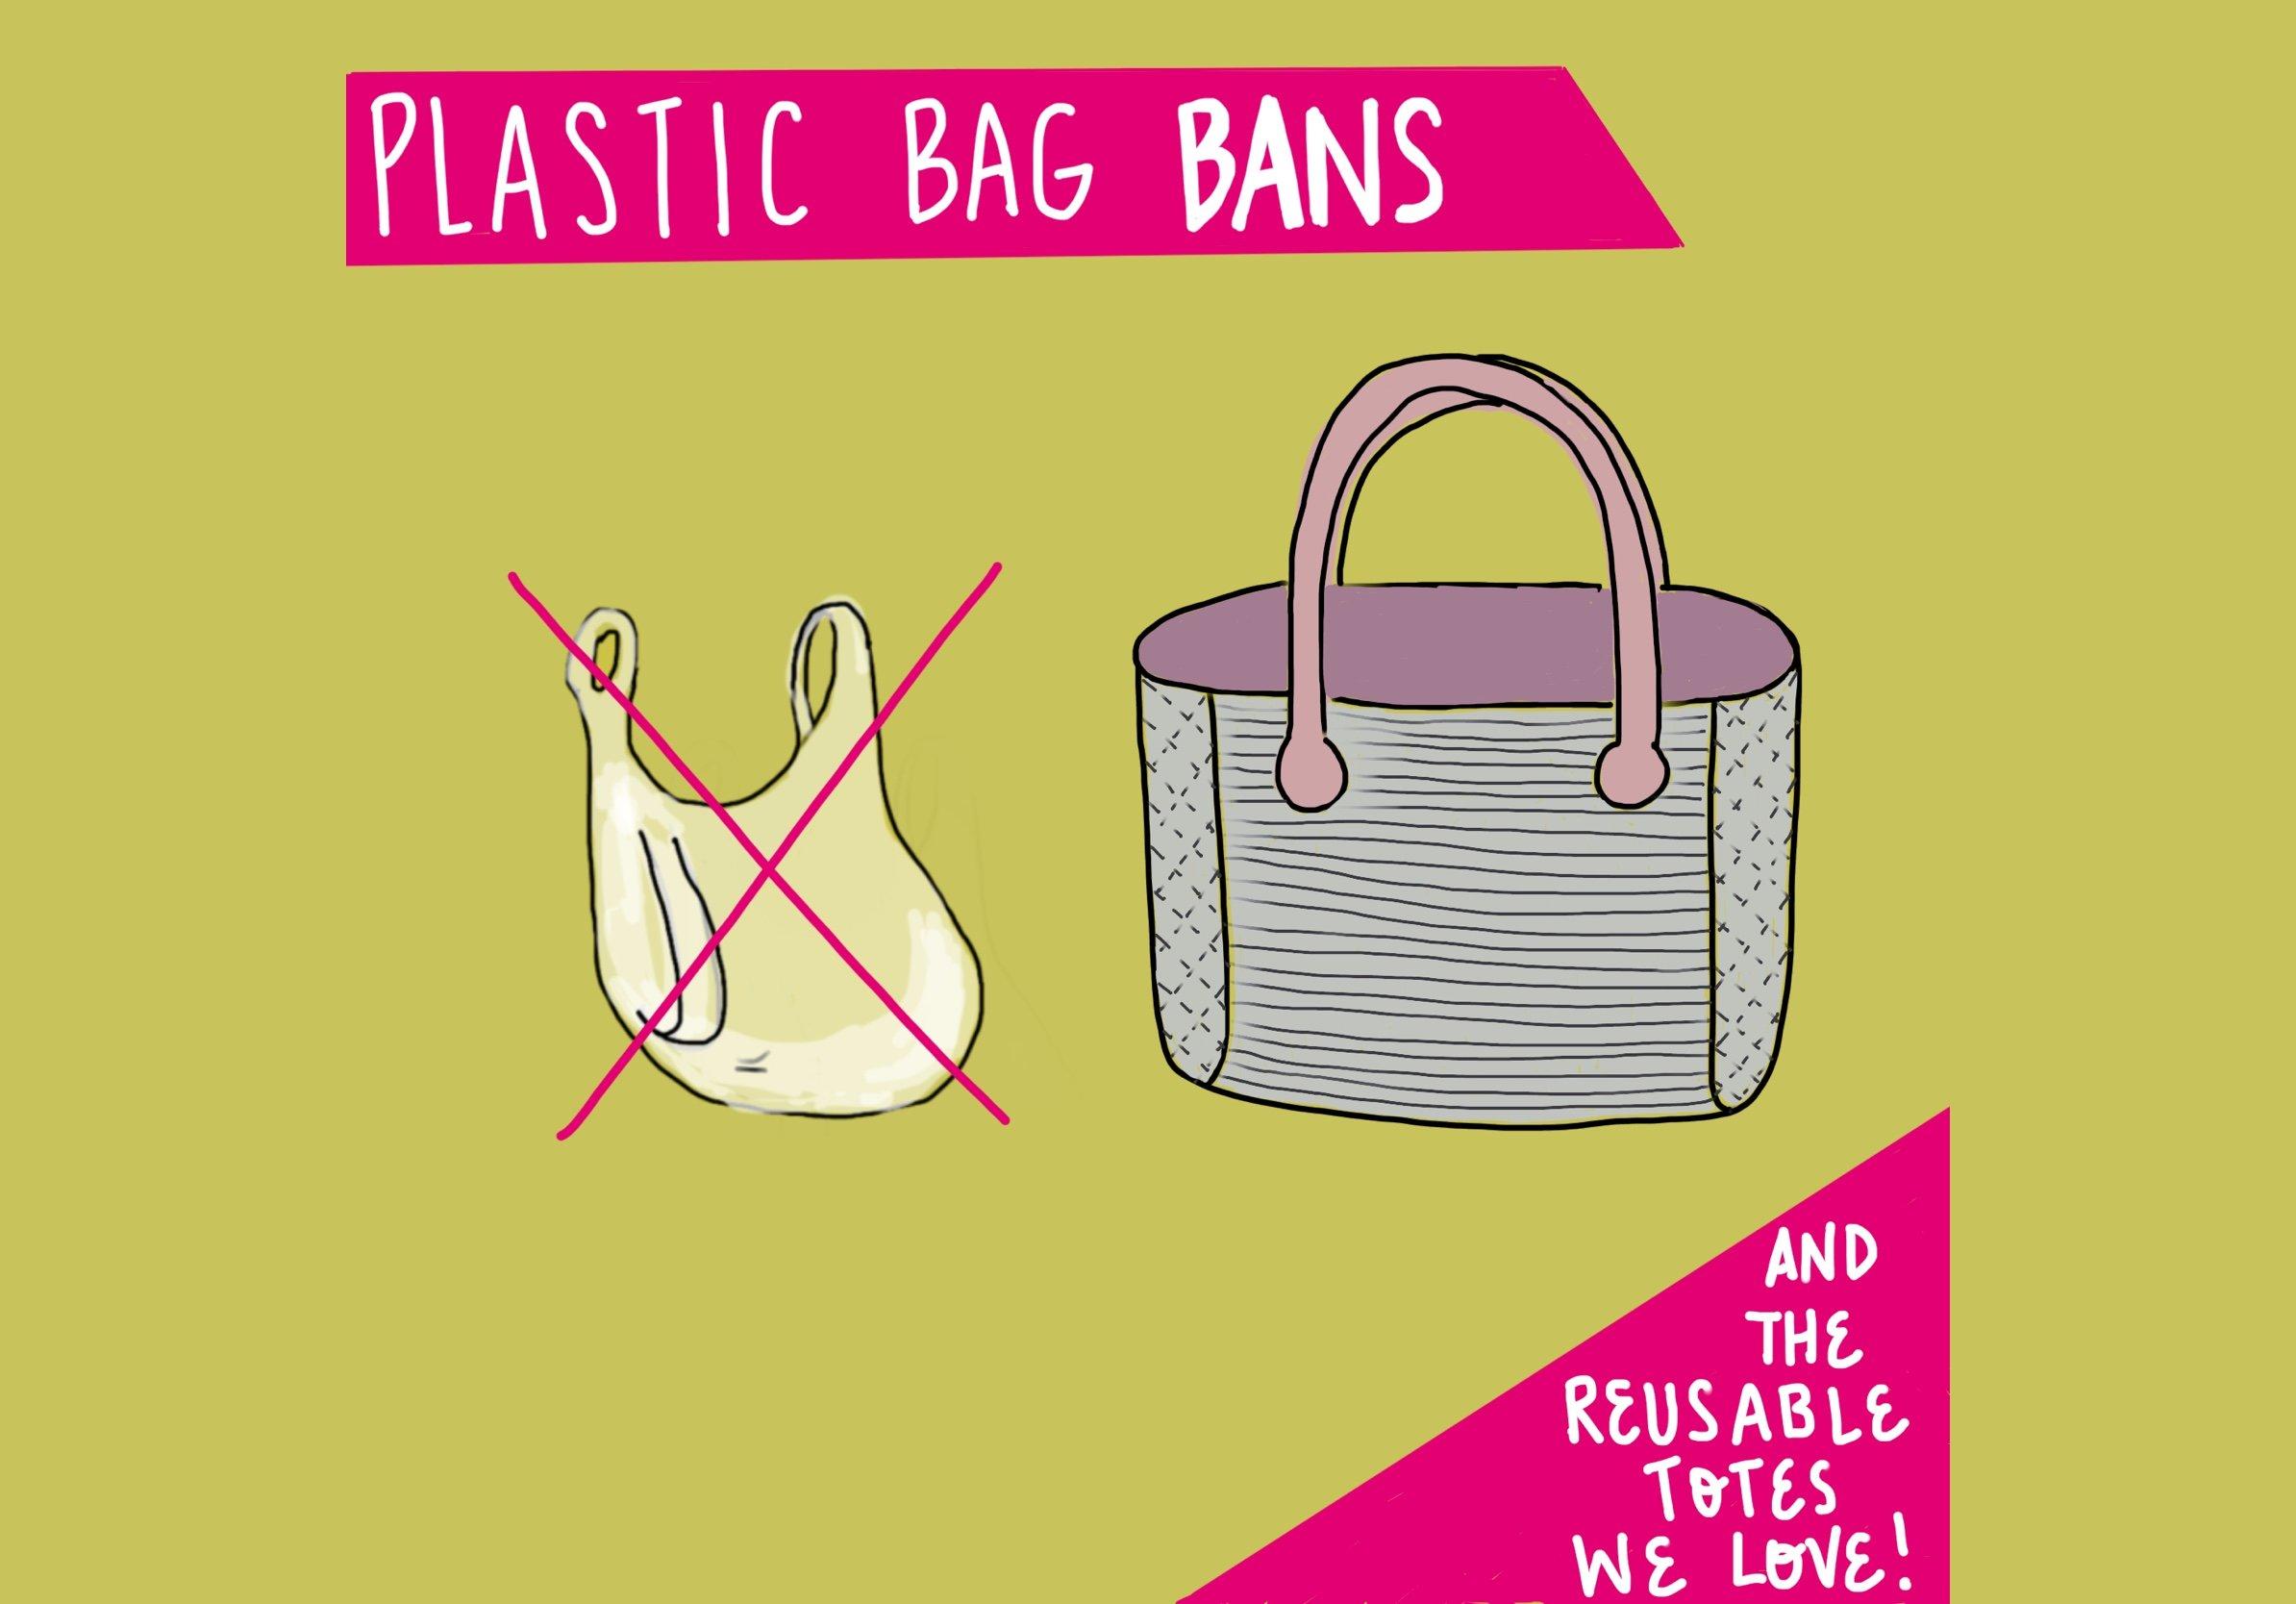 Plastic Bag Bans and Reusable Totes we love FeelGood Fibers